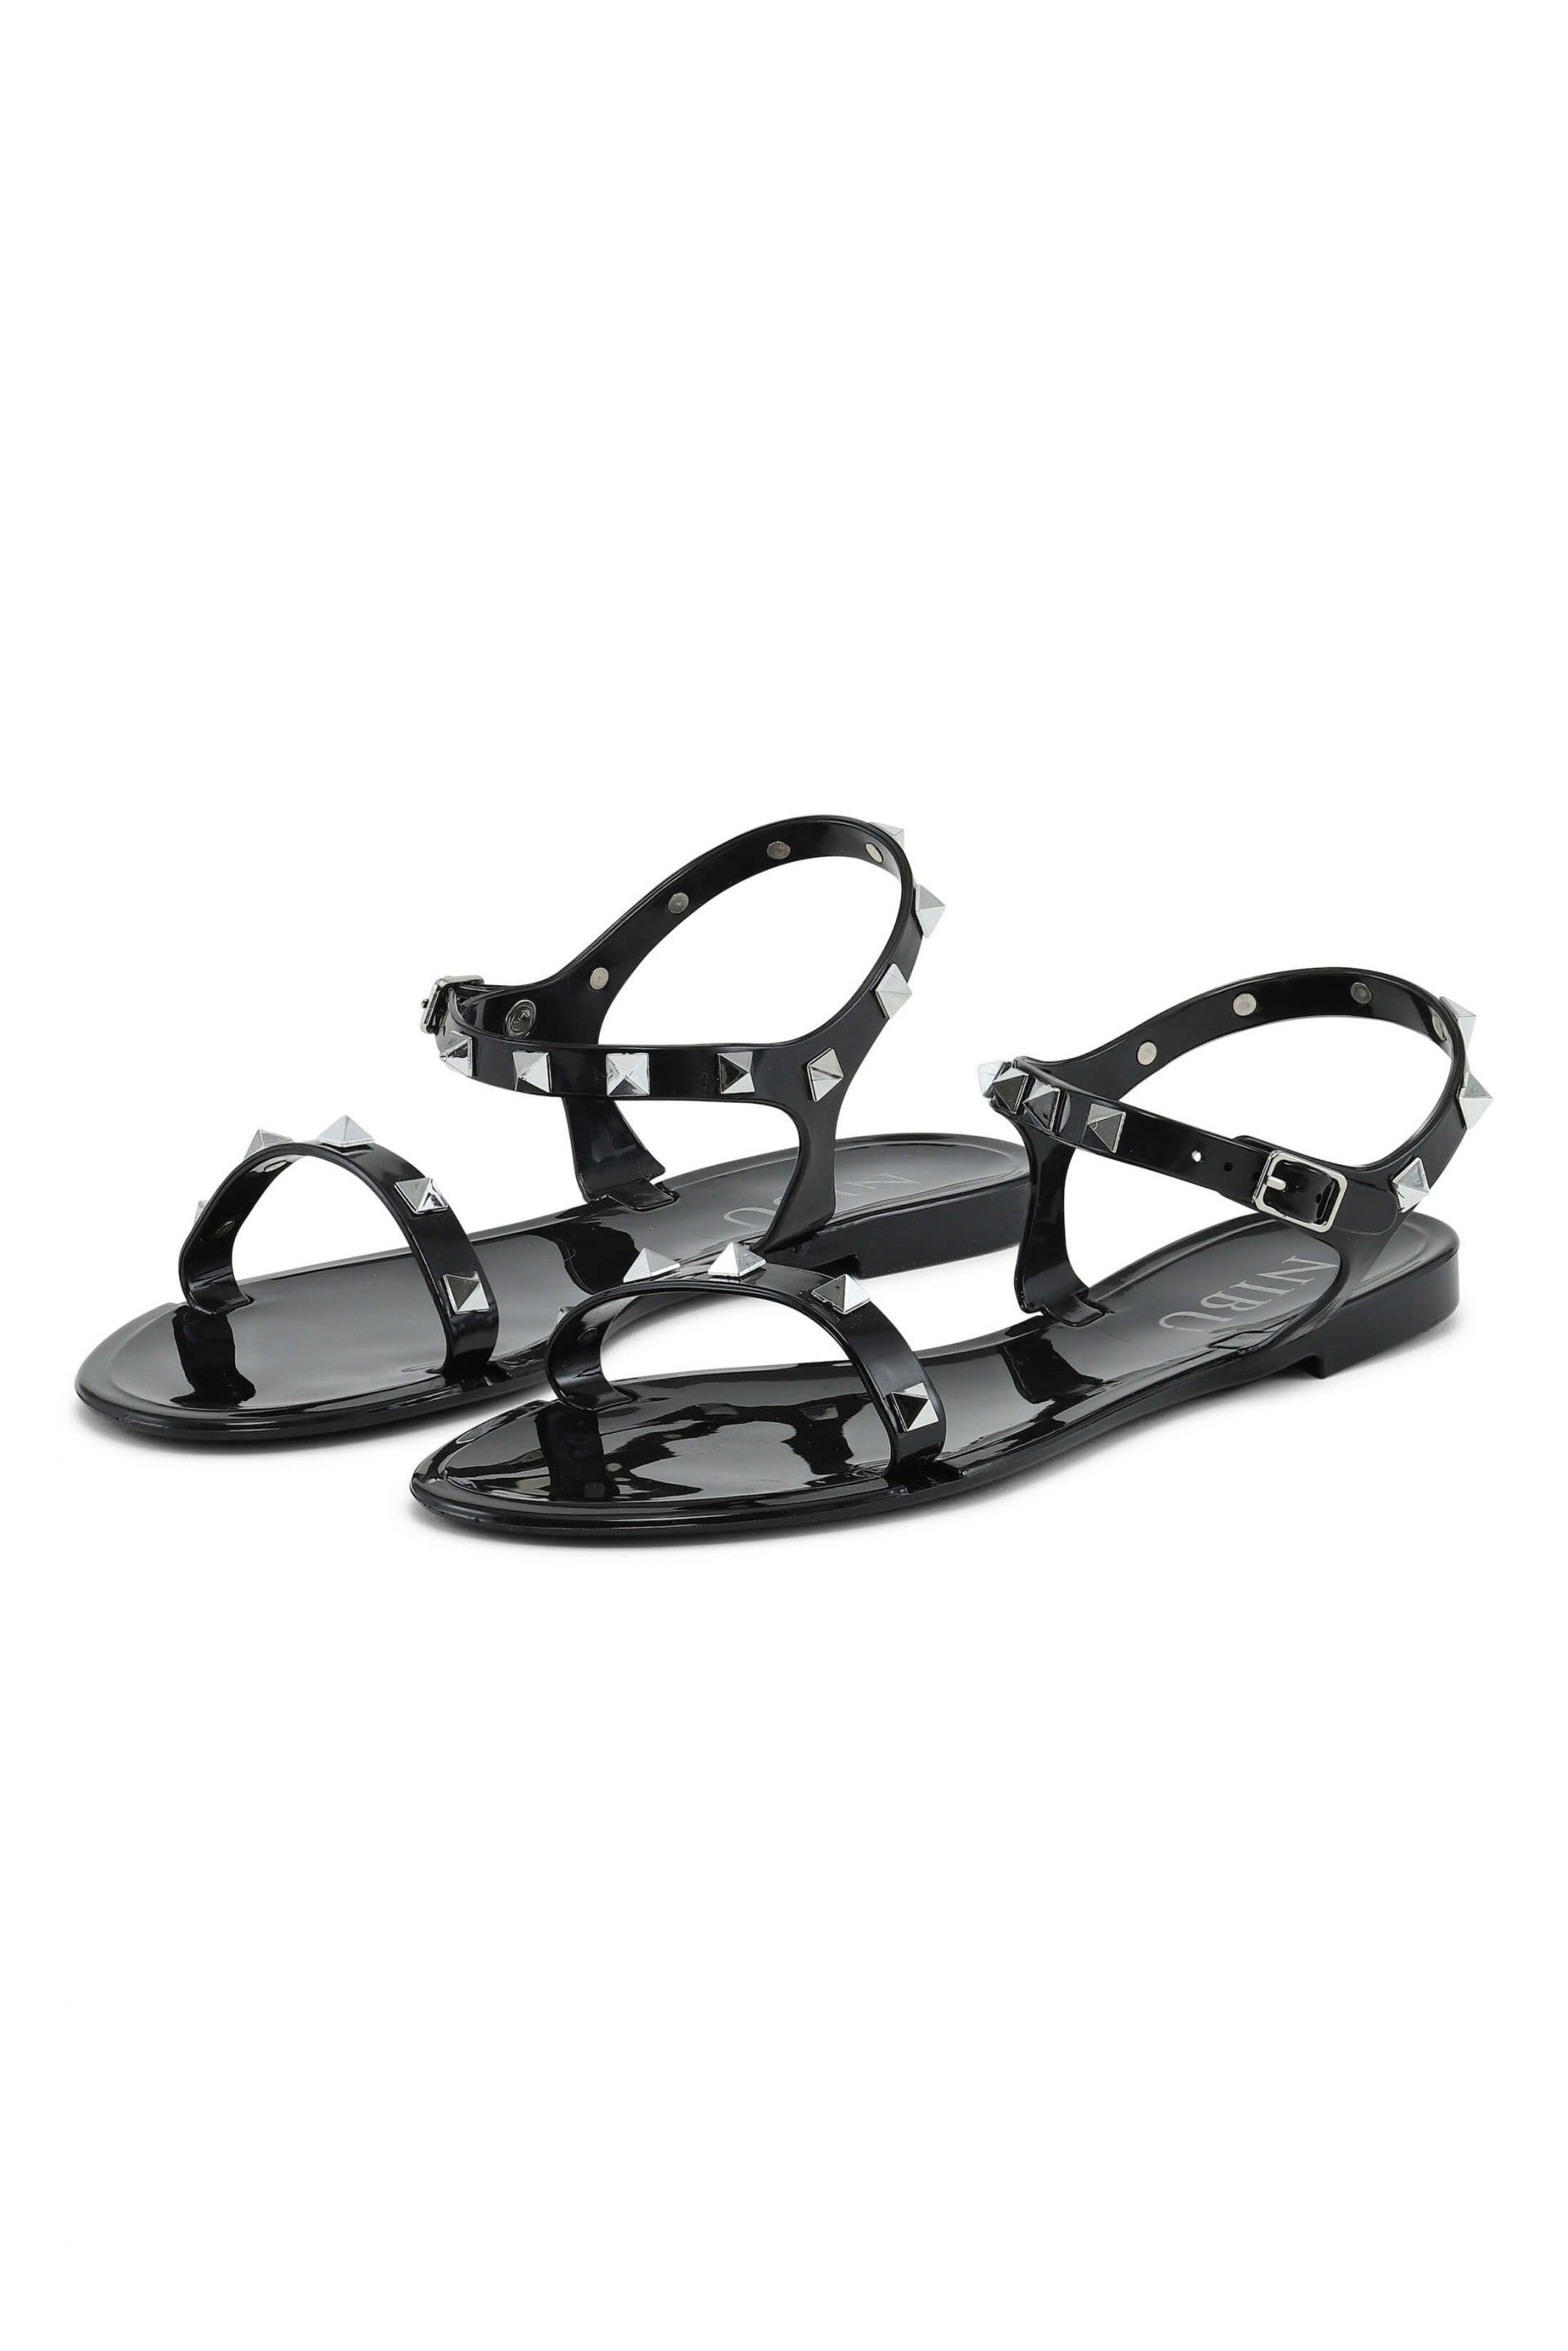 Black sandals with silverlook details